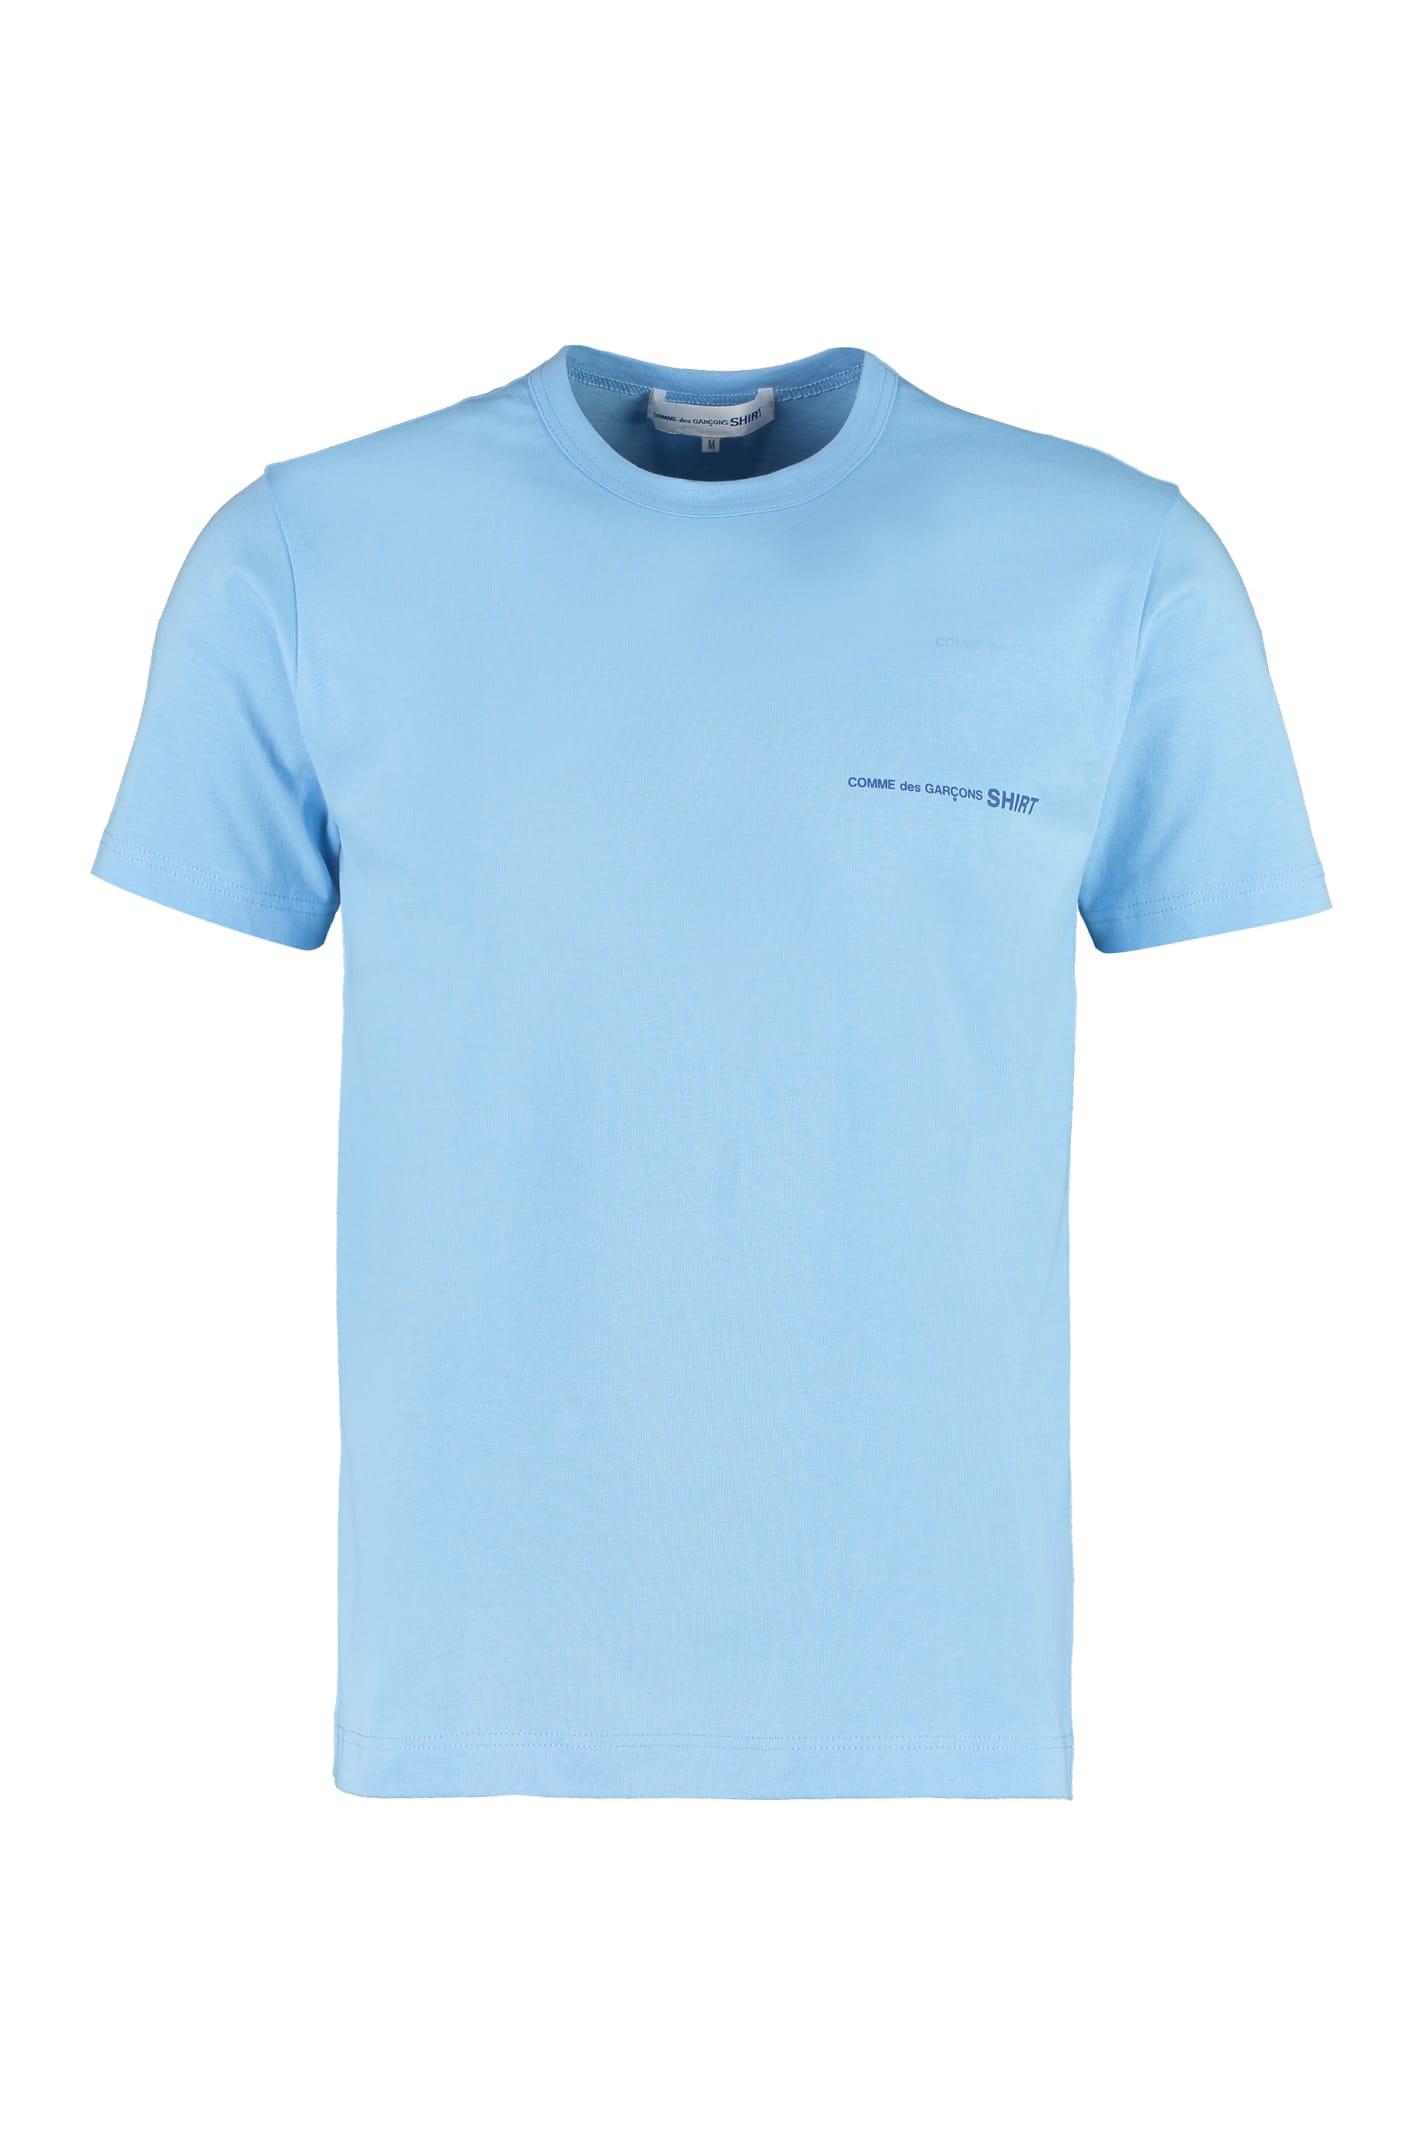 Comme Des Garçons Shirt Cottons LOGO COTTON T-SHIRT